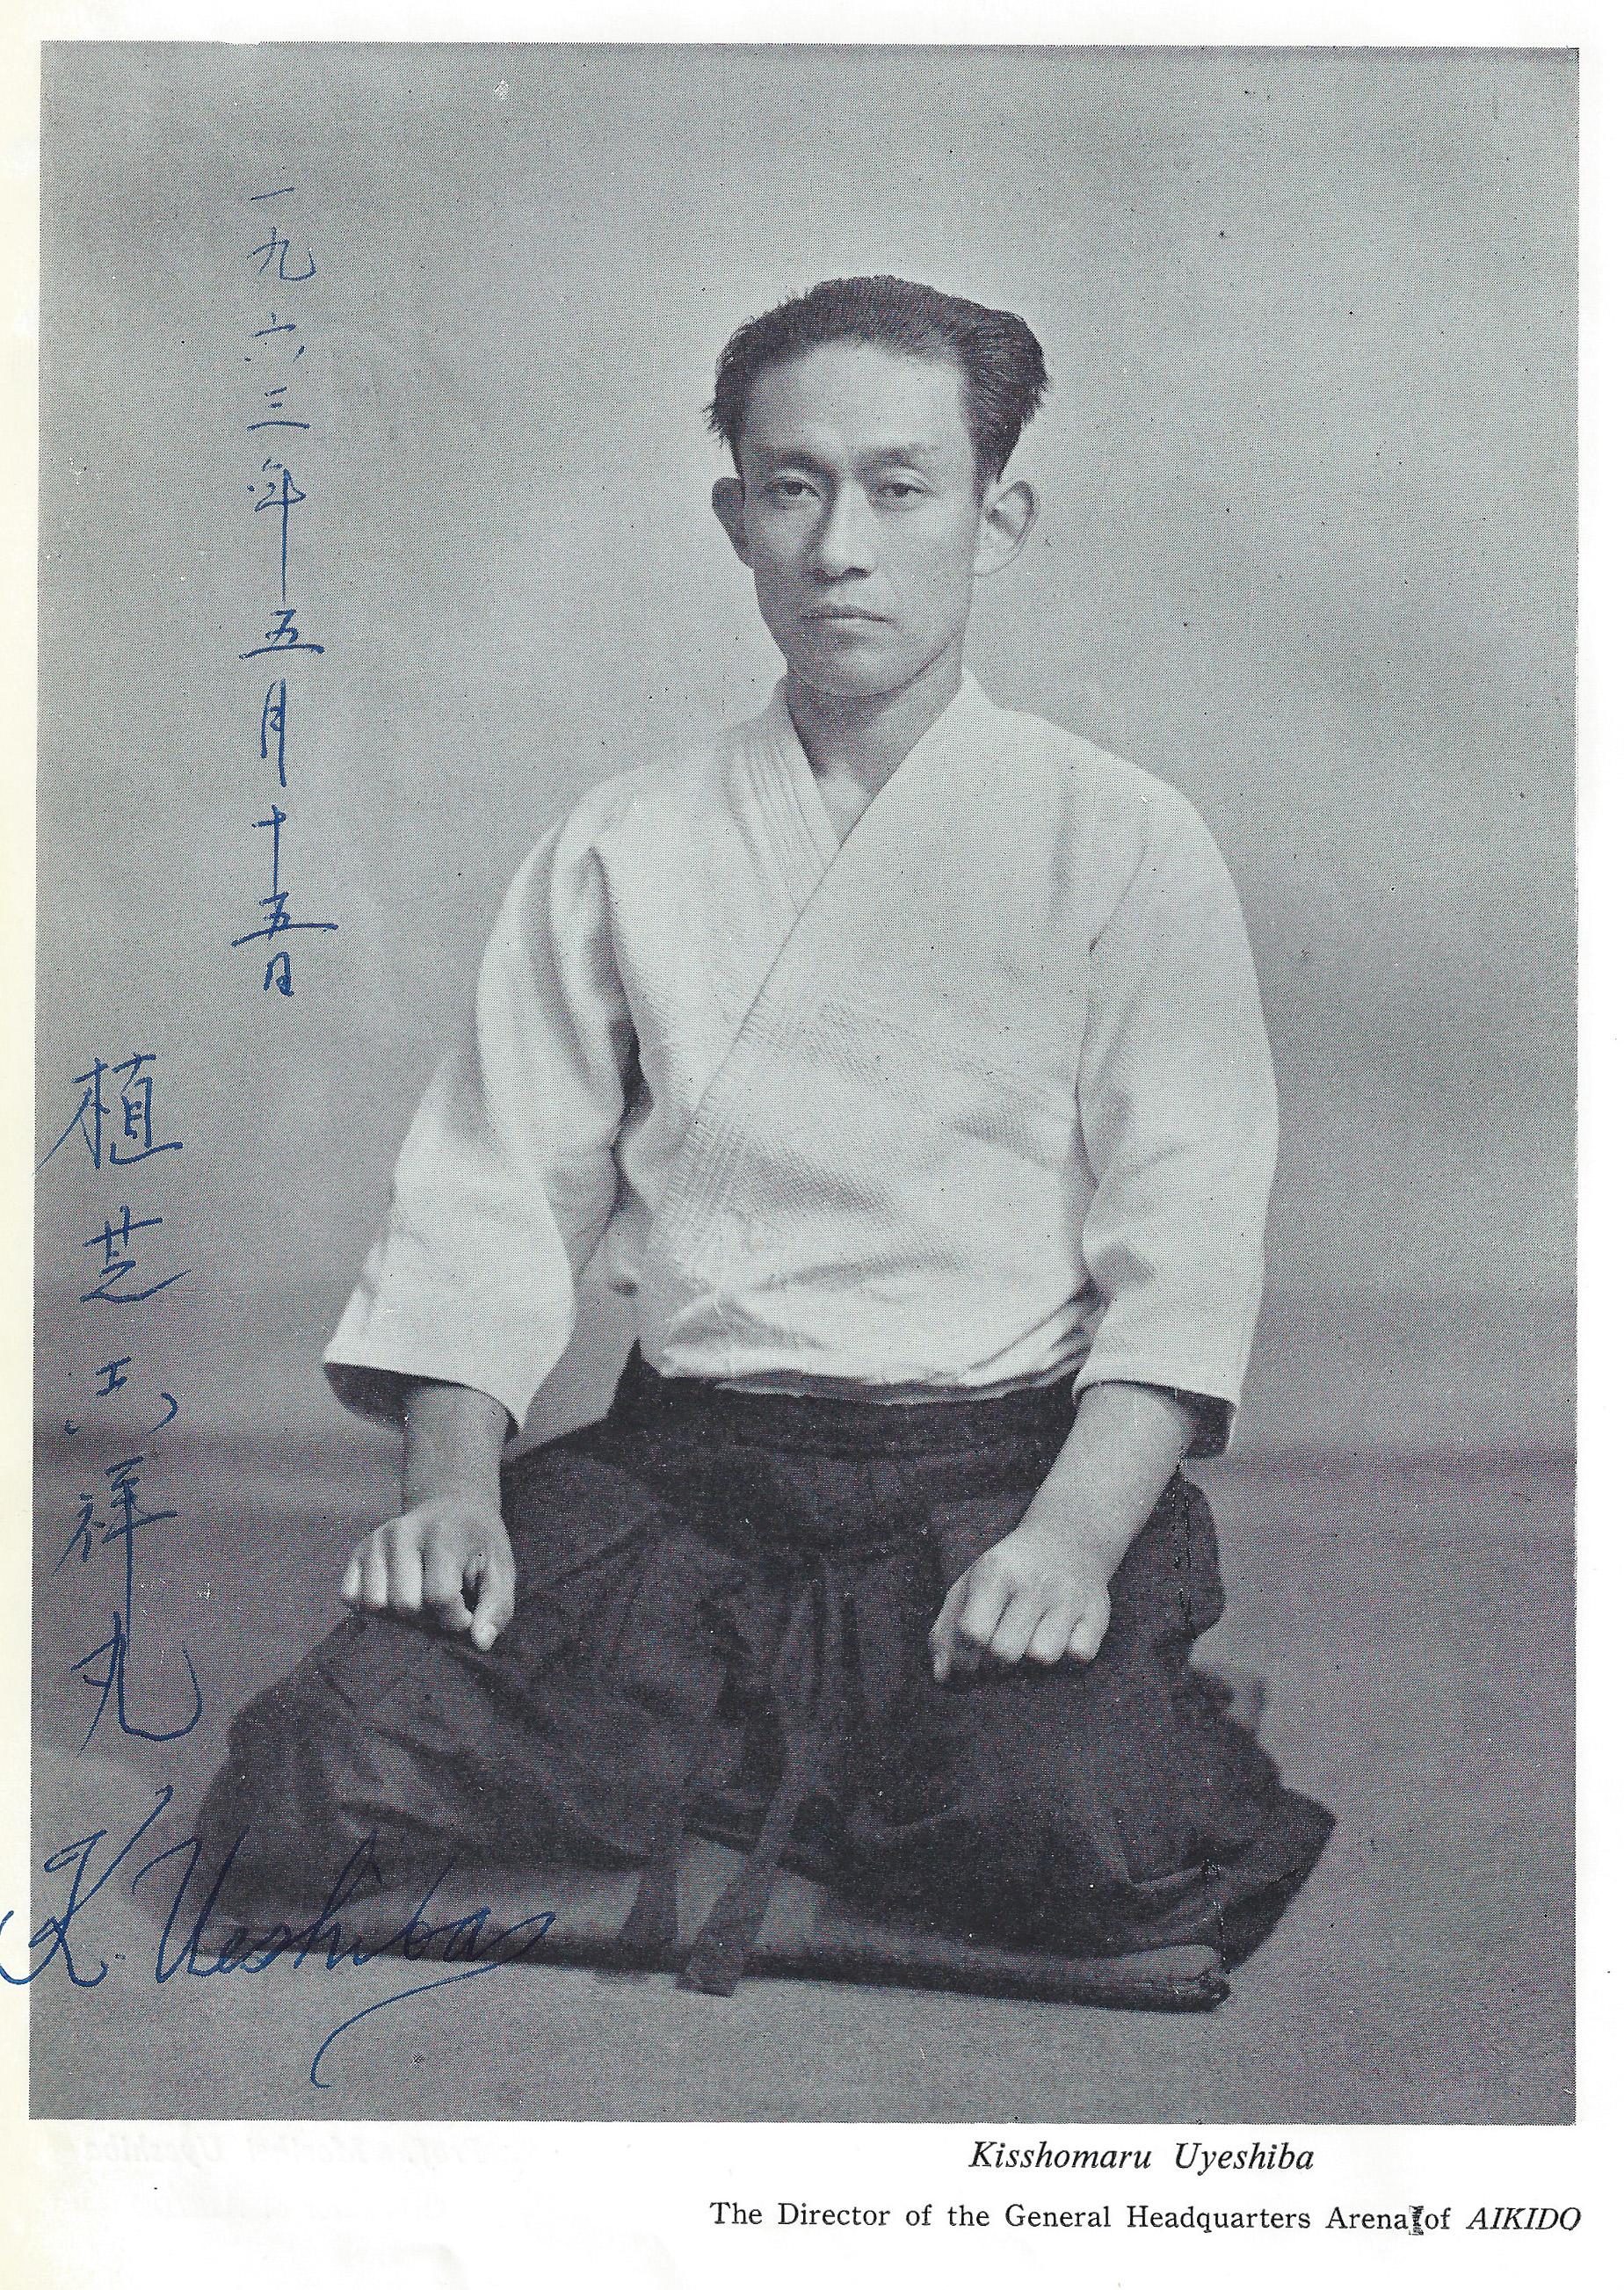 Kisshomaru Uyeshiba (Dosshu)